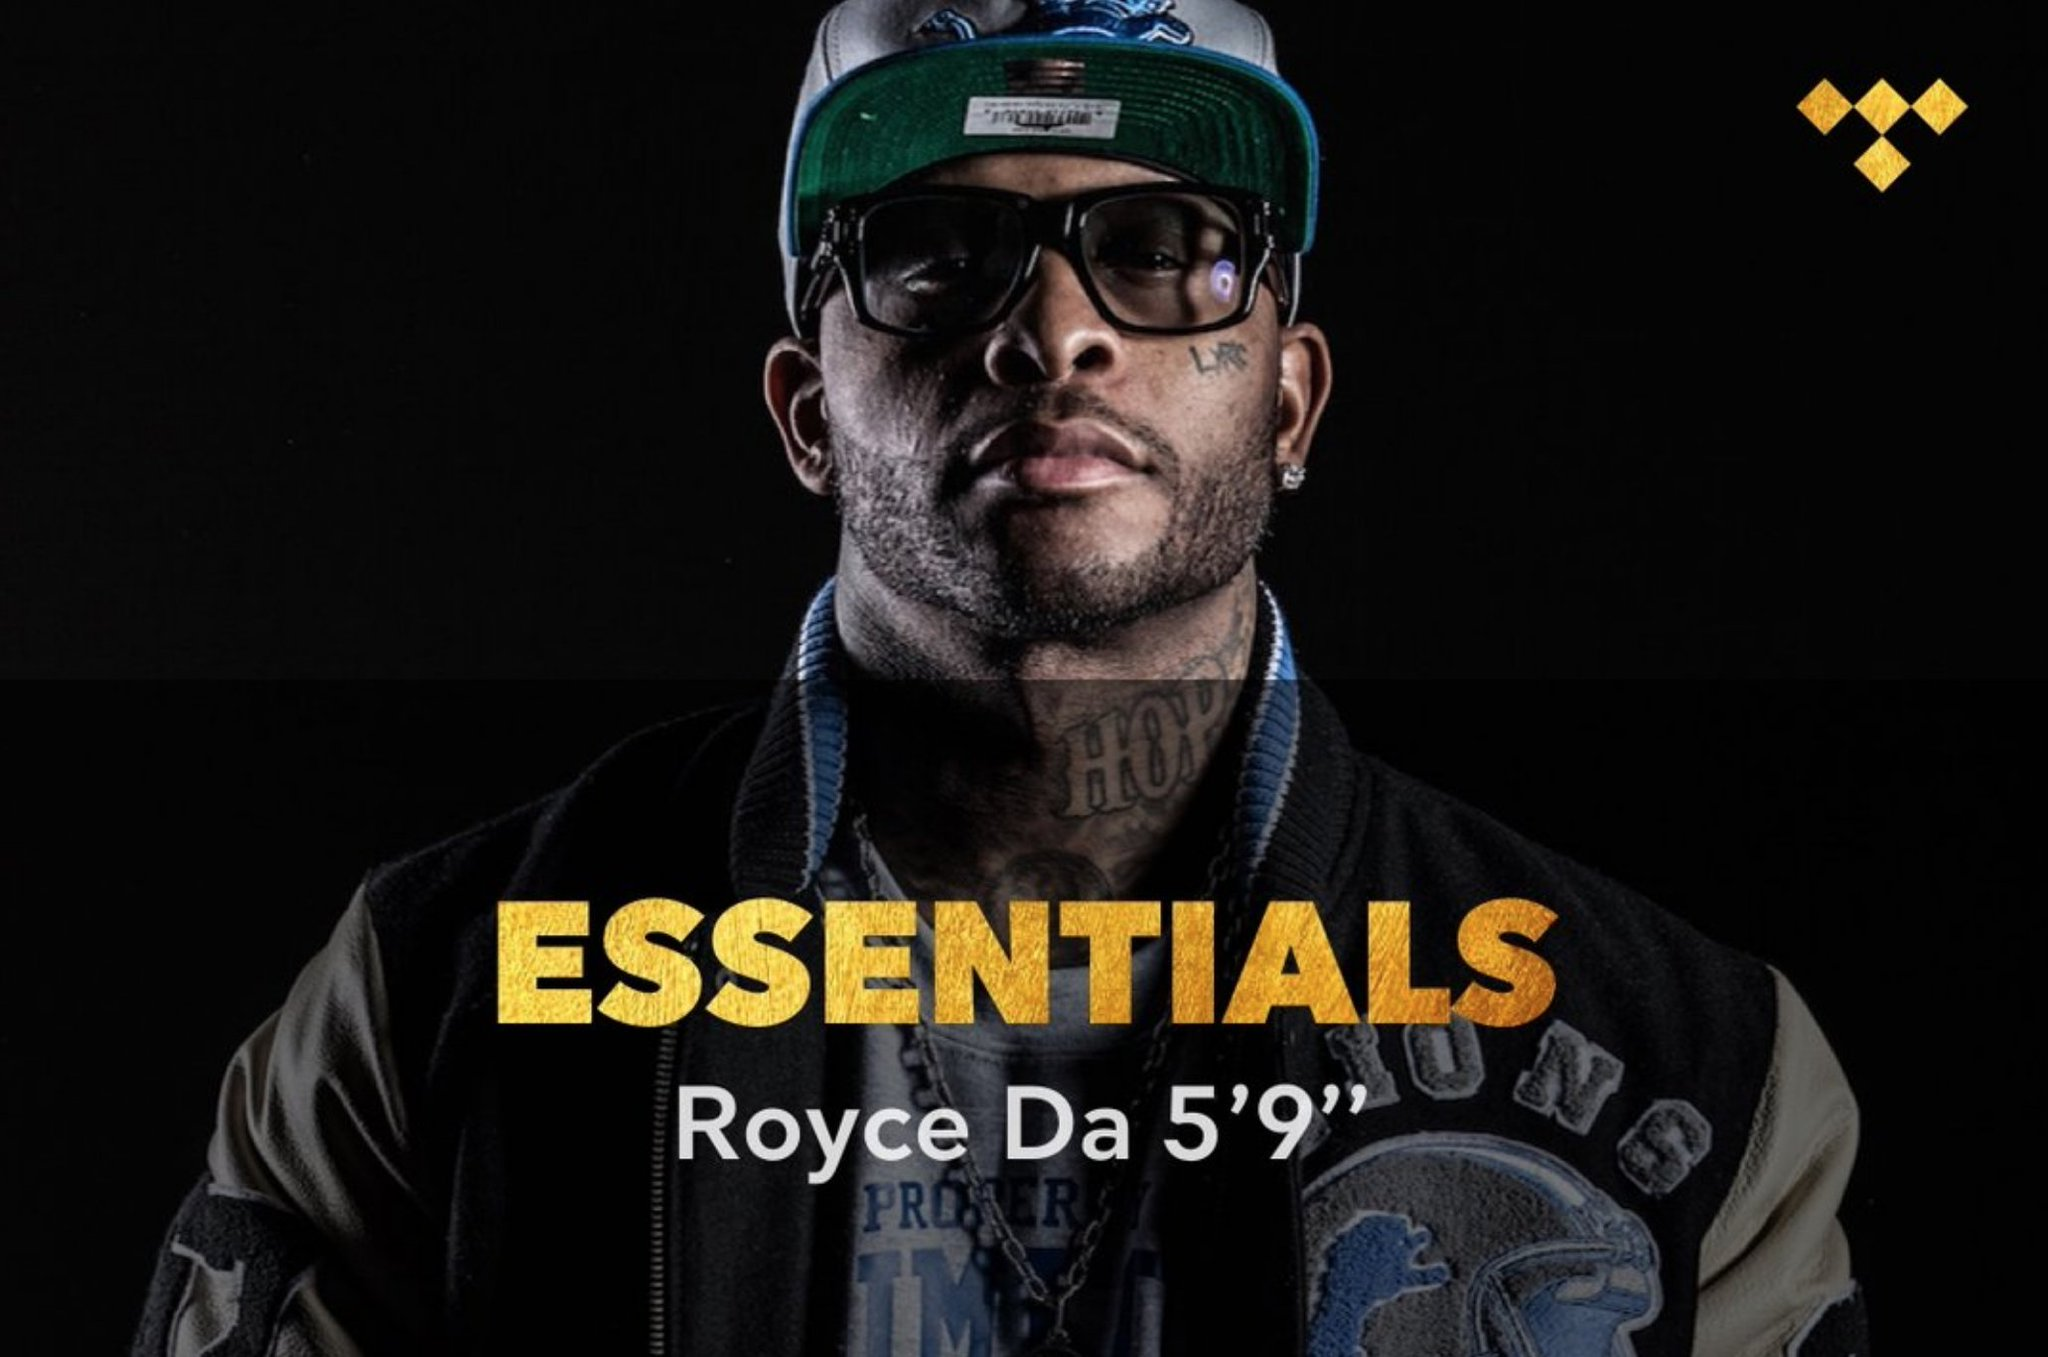 Royce Da 5'9' Essentials https://t.co/vG3KQNQHZF #TIDAL https://t.co/cCiz7mfc2o